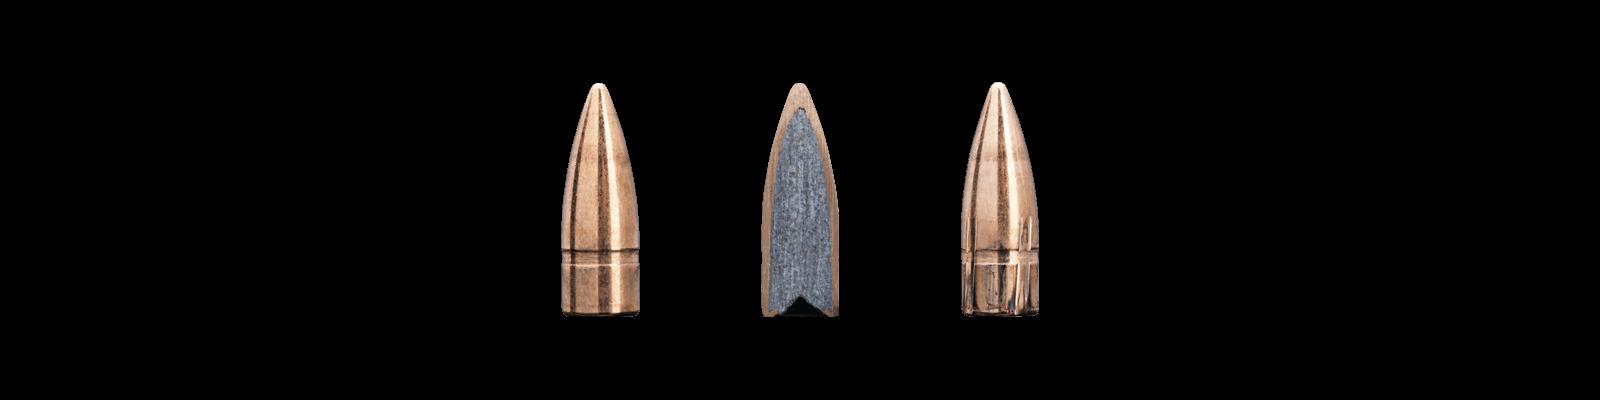 Sako 222 Rem Mag Speedhead 3,2g (105G) 20 kpl / ras